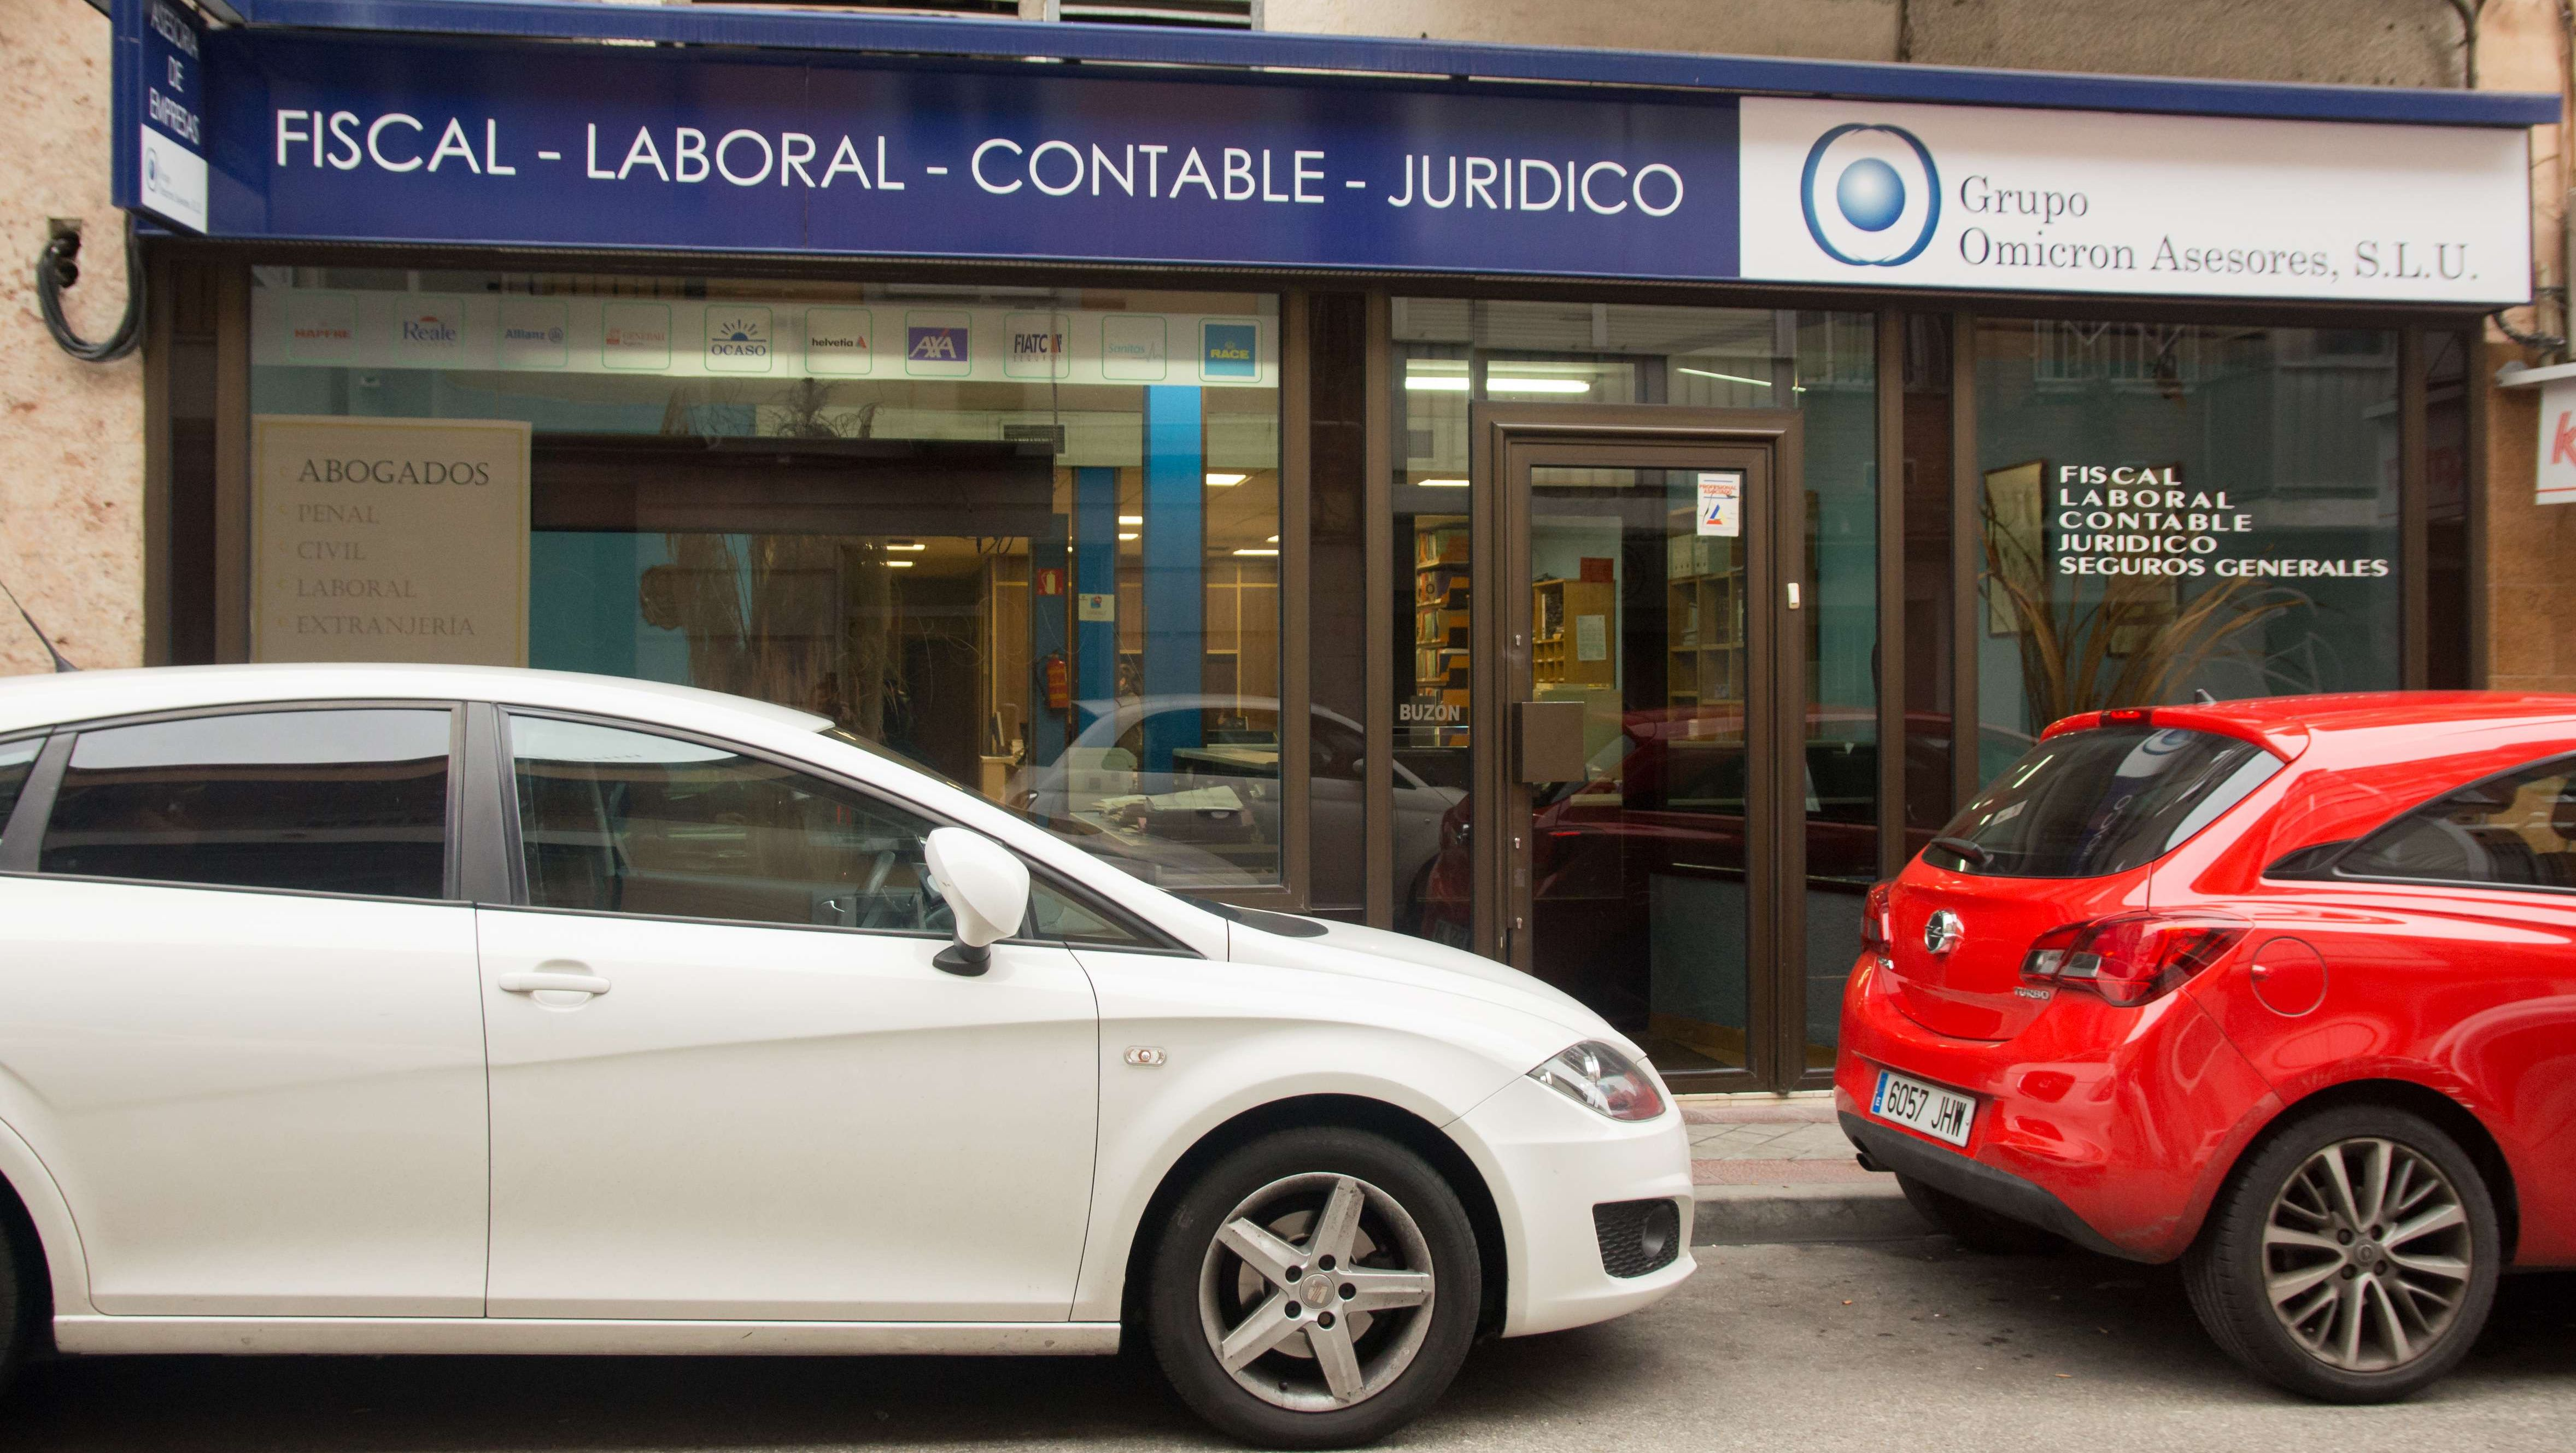 Grupo Omicron Asesores en Fuenlabrada, Madrid